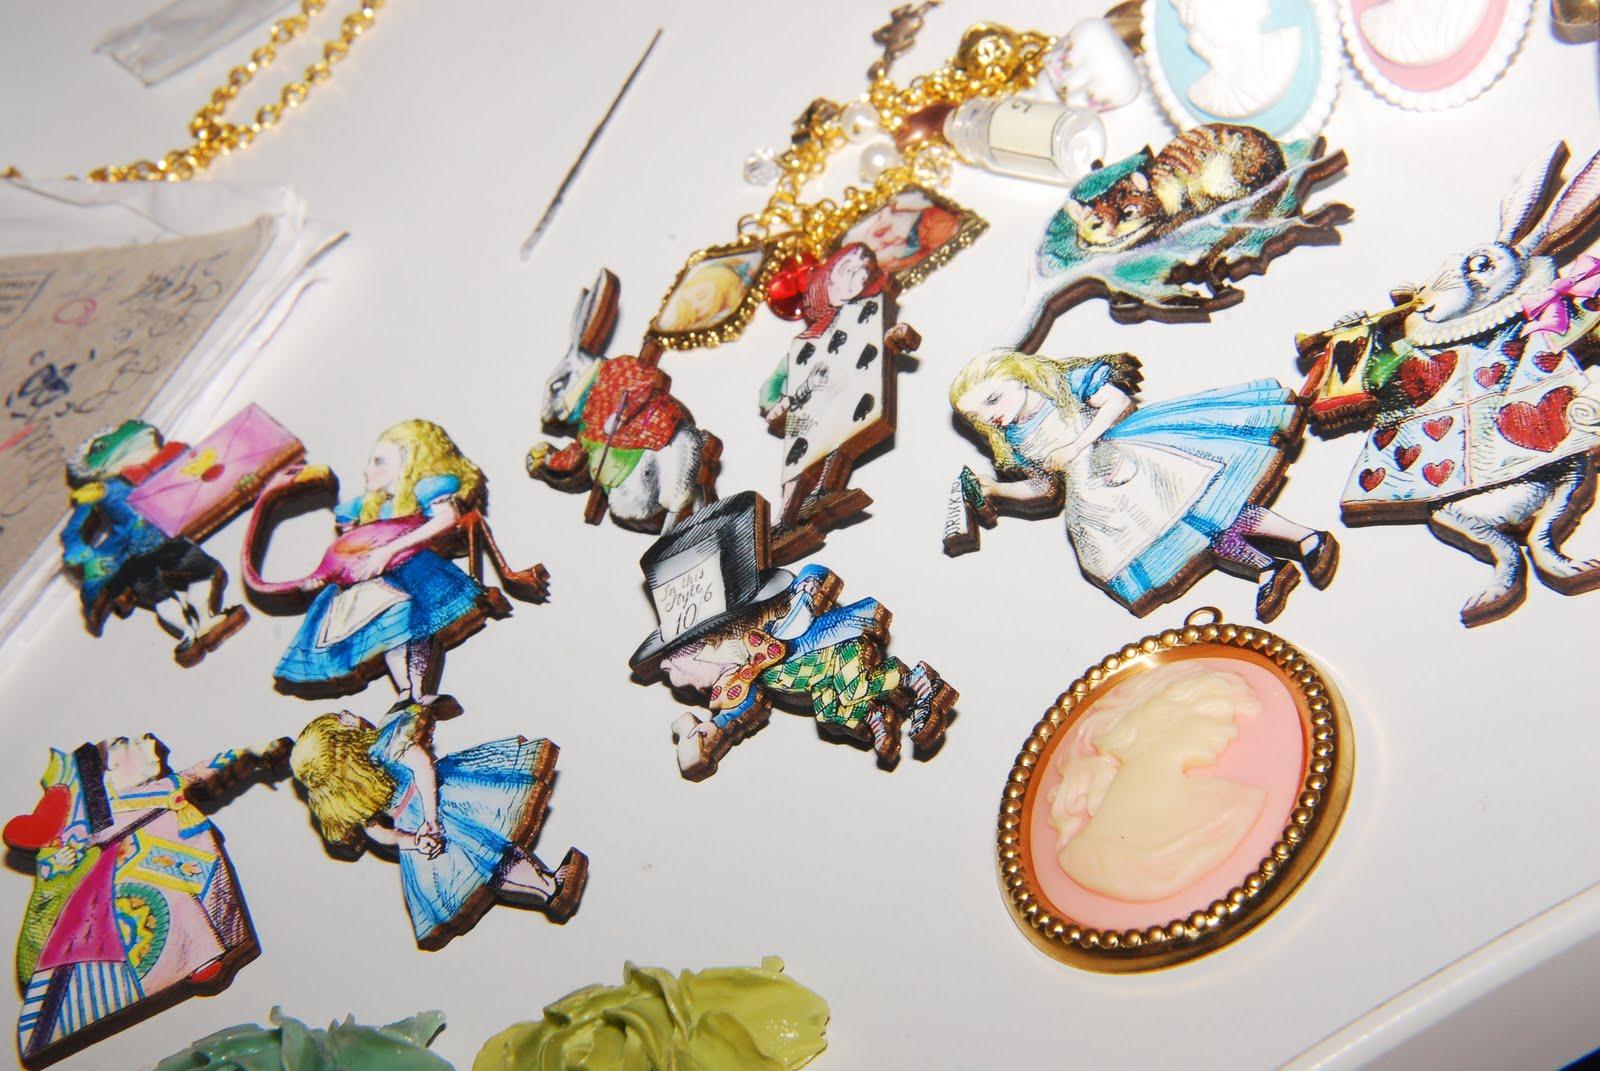 Alice In Wonderland jewellery